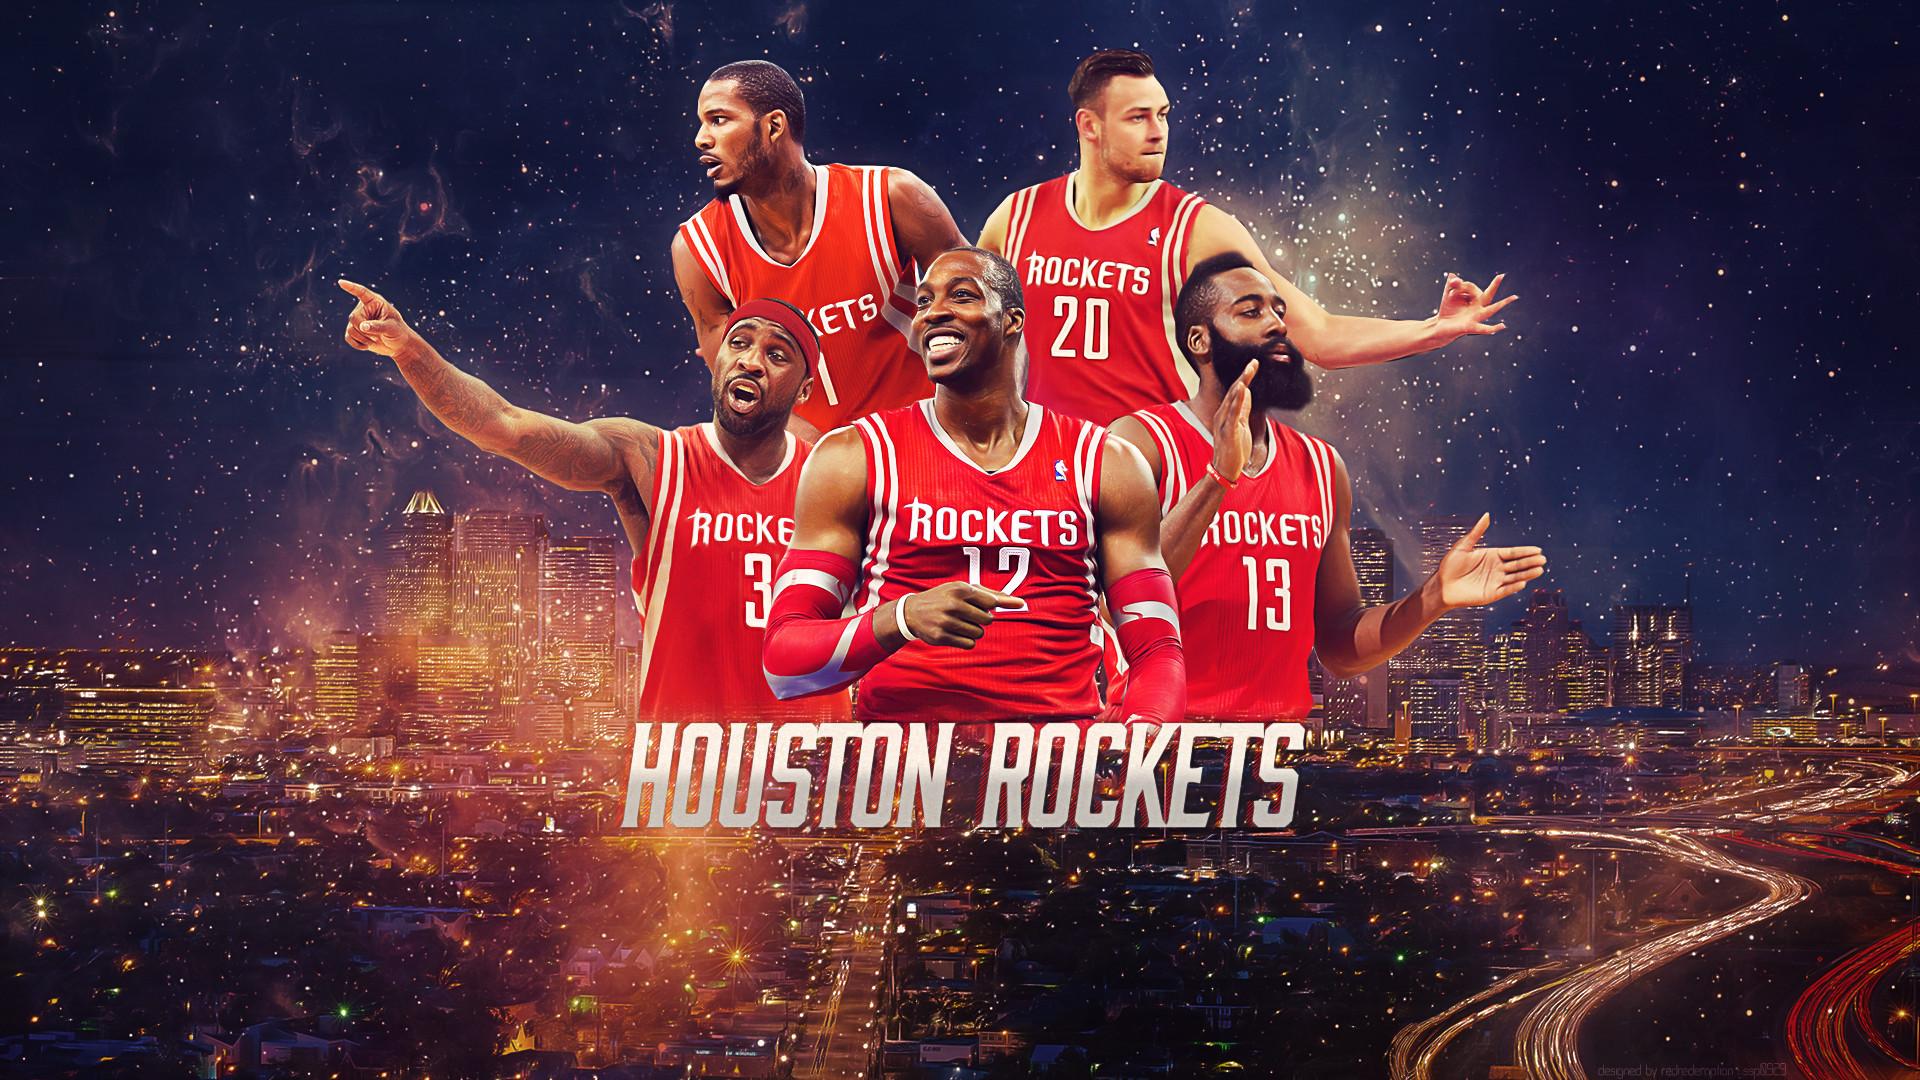 Galerry Houston Rockets 2015 2016 Wallpaper WallpaperSafari